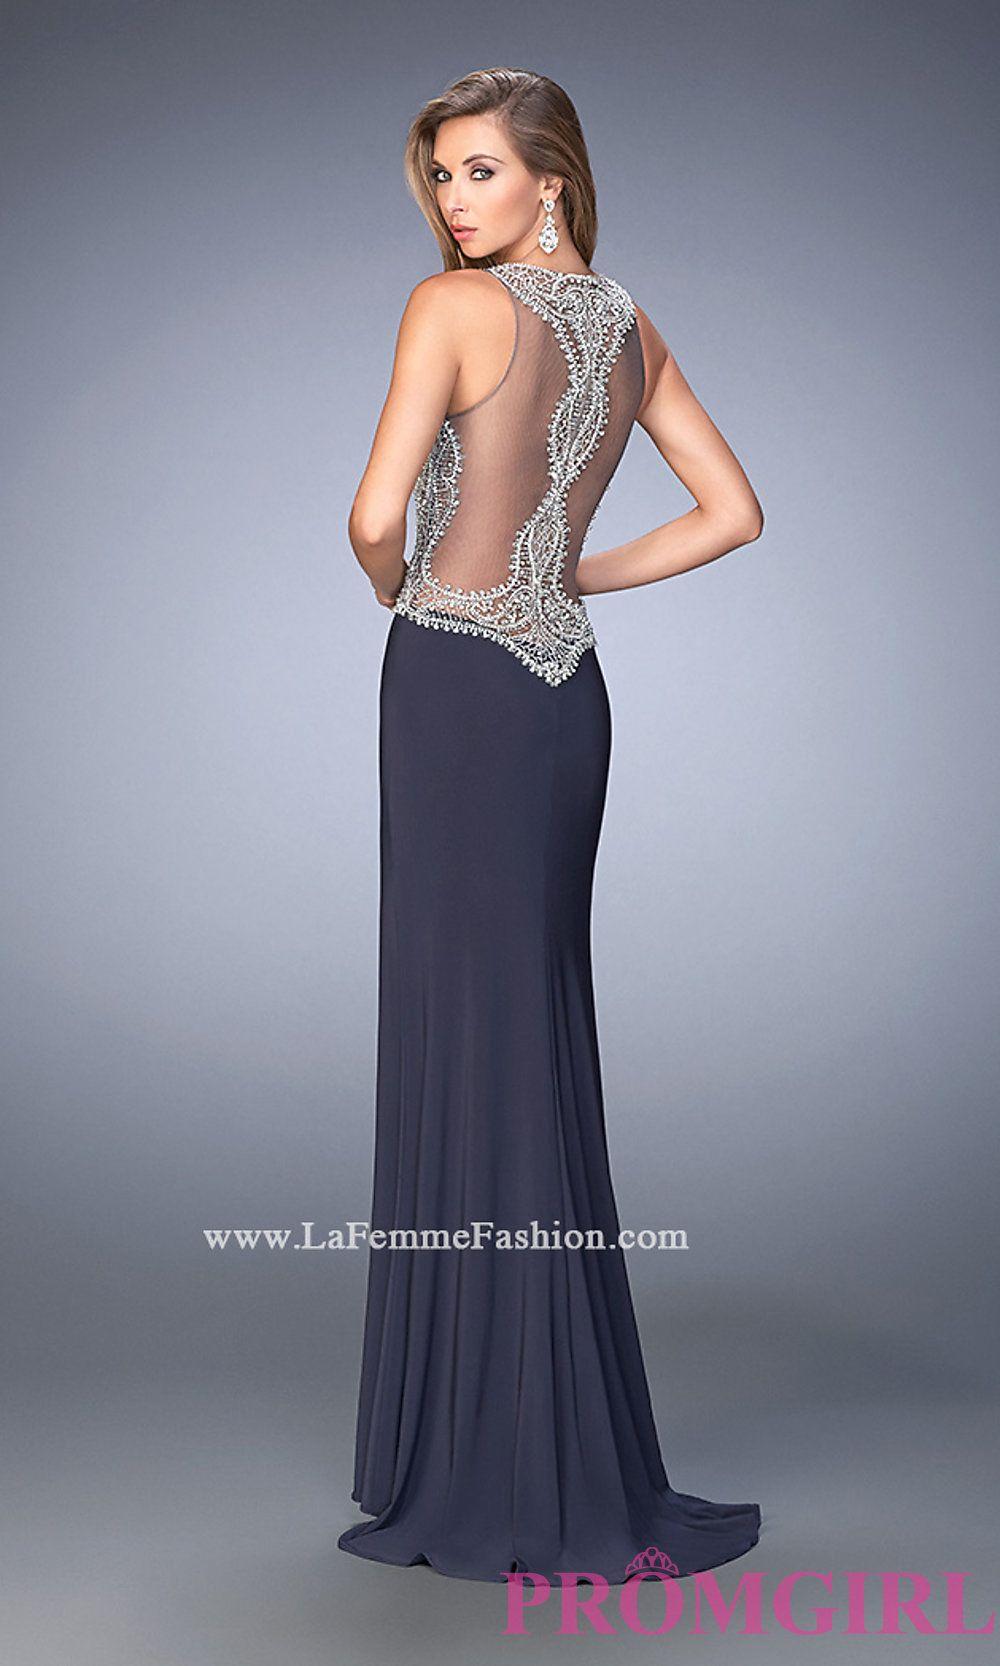 Sheer Back Long High Neck Prom Dress by Gigi Style: LF-22658 ...